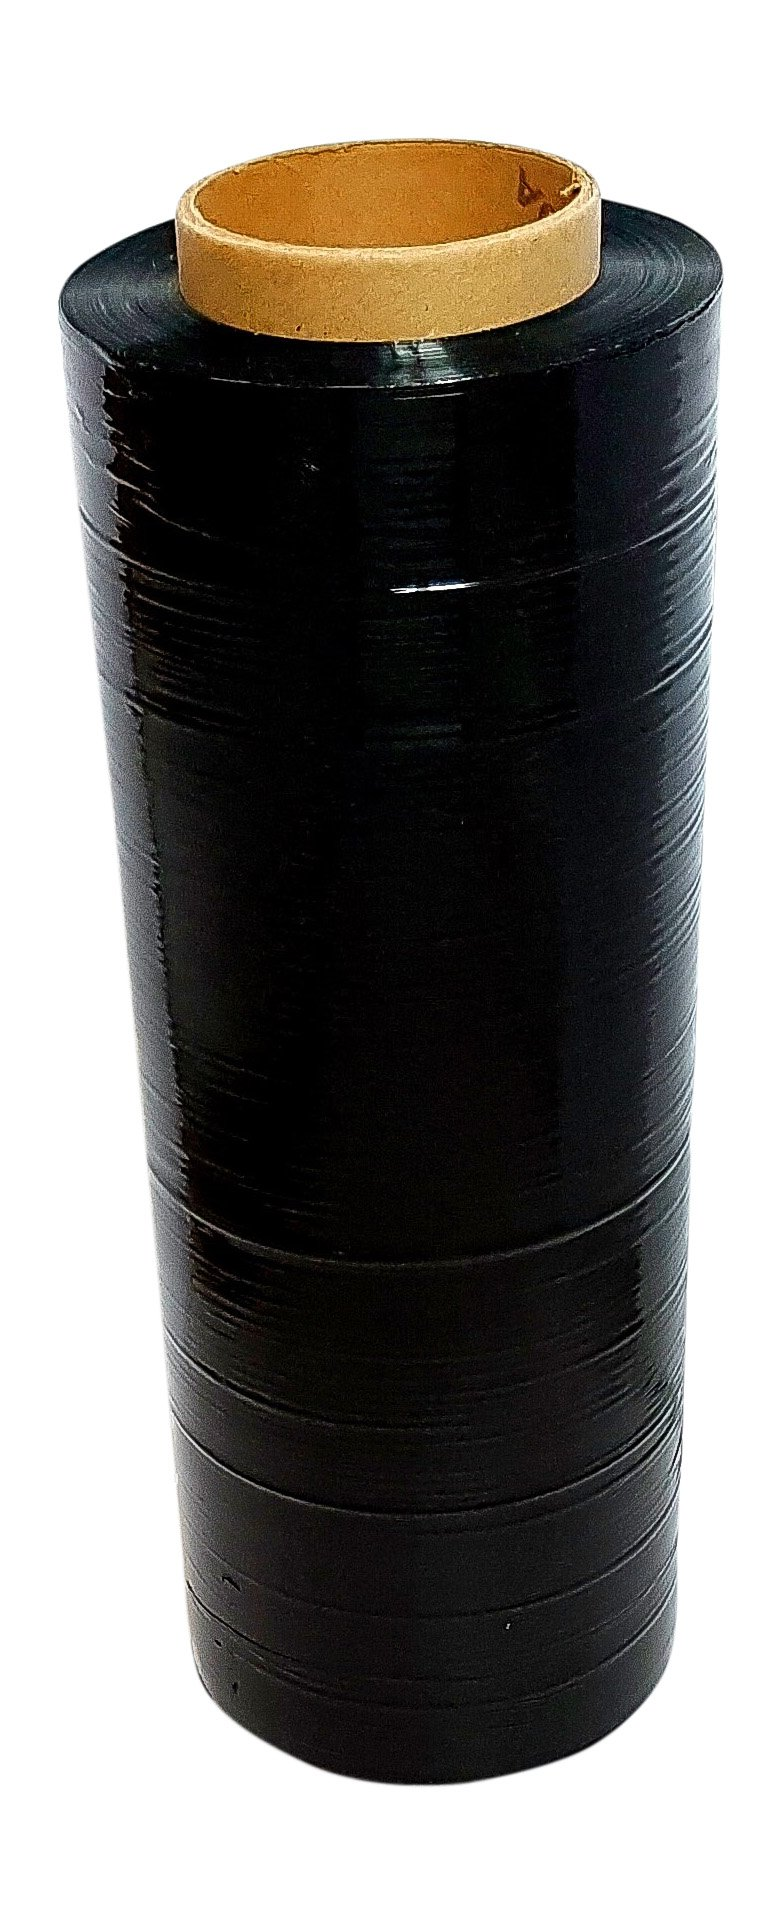 Black Pallet Wrap Stretch Film Hand Wrap with 1 Roll 75 Gauge 14'' Long x 1500 FT Long Wrap Boxes Pallets